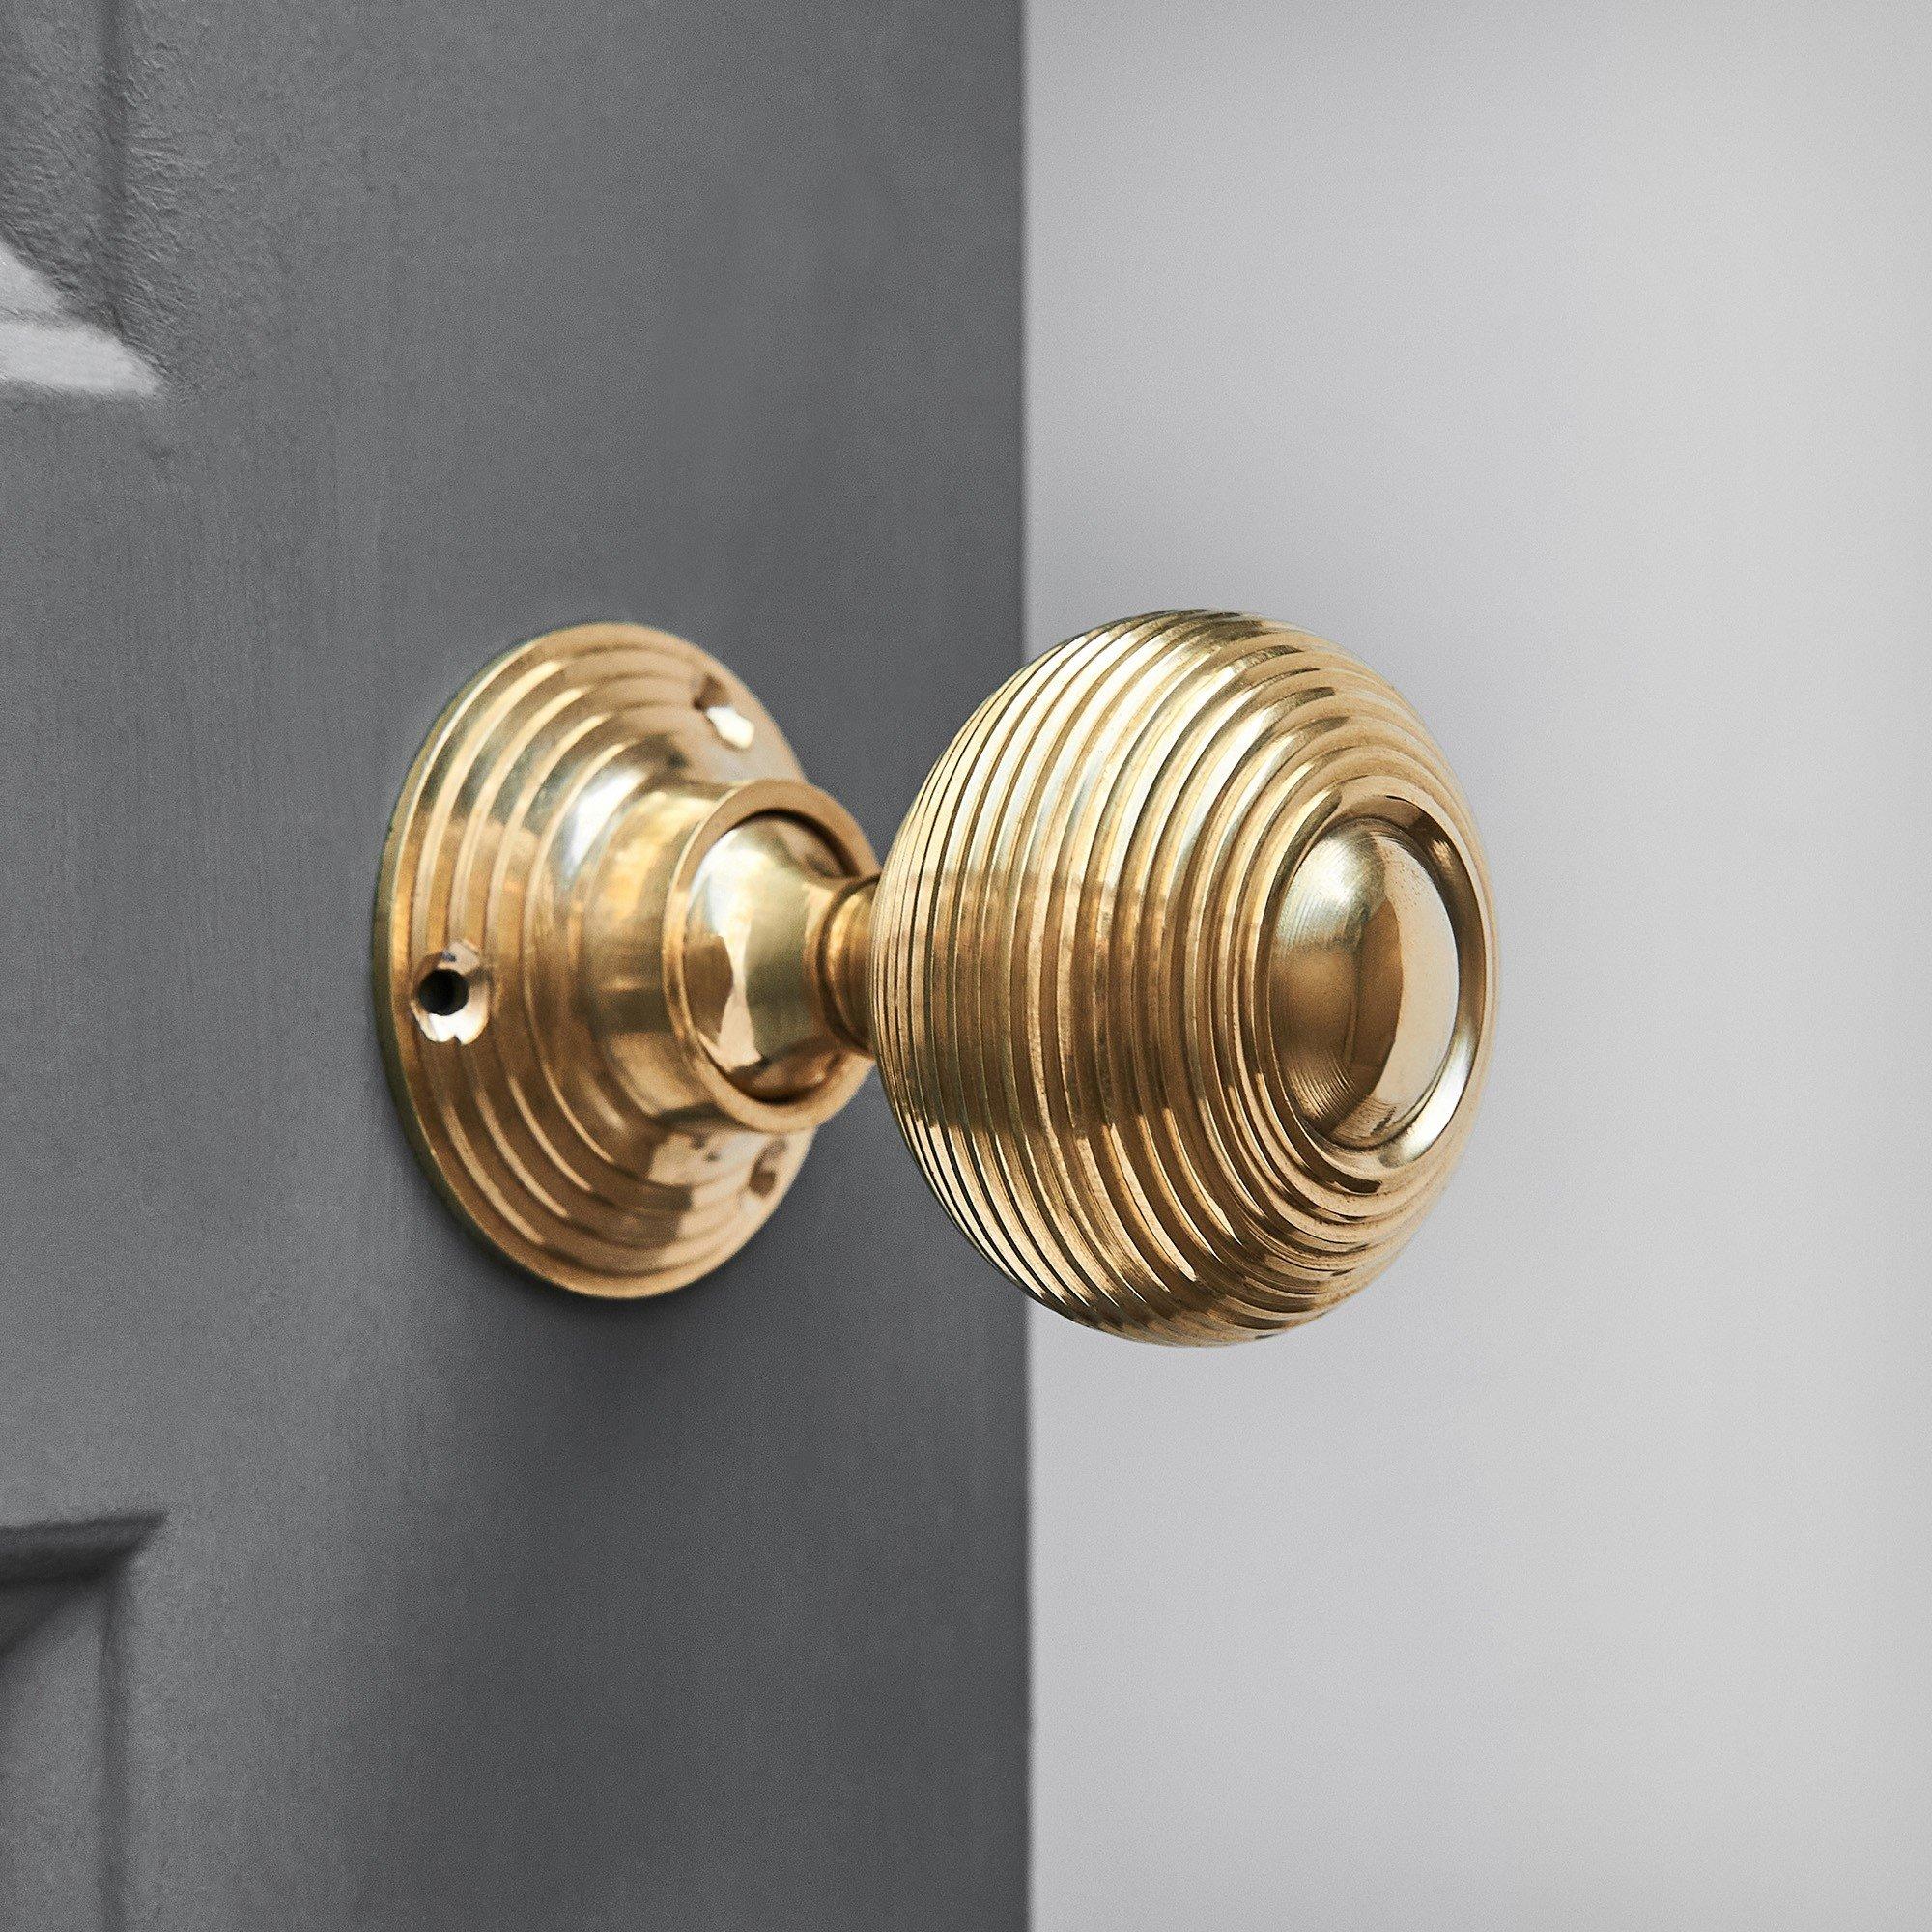 Beehive Door Knobs (Pair) - Polished Brass save 10%